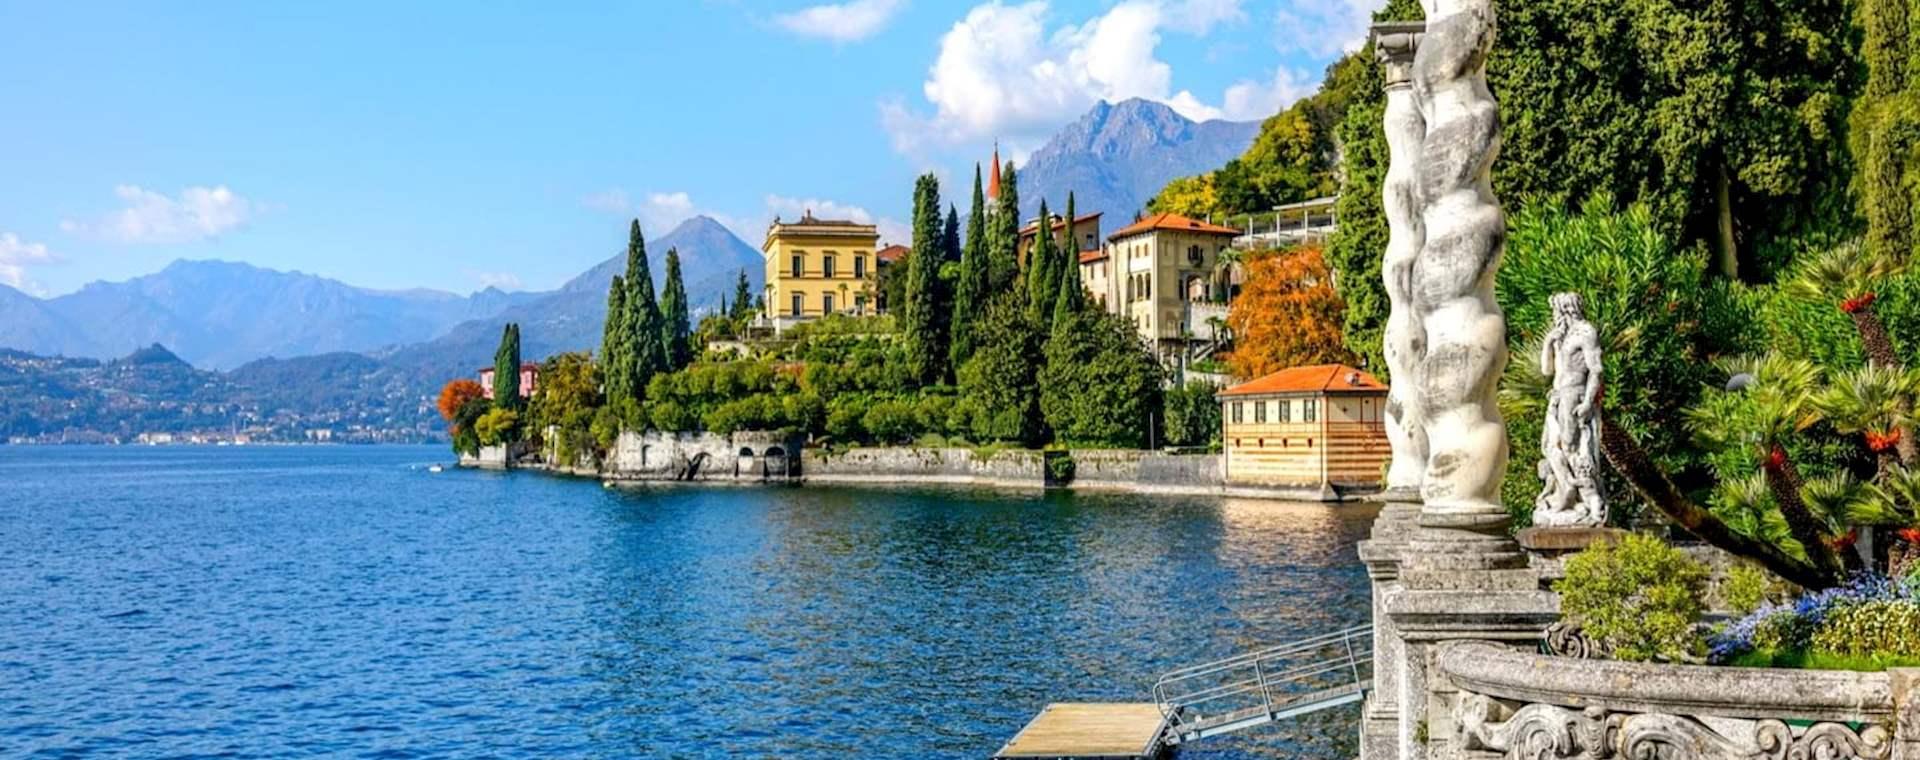 Day Trip: Lake Como from Milan with Bellagio & Lugano Switzerland